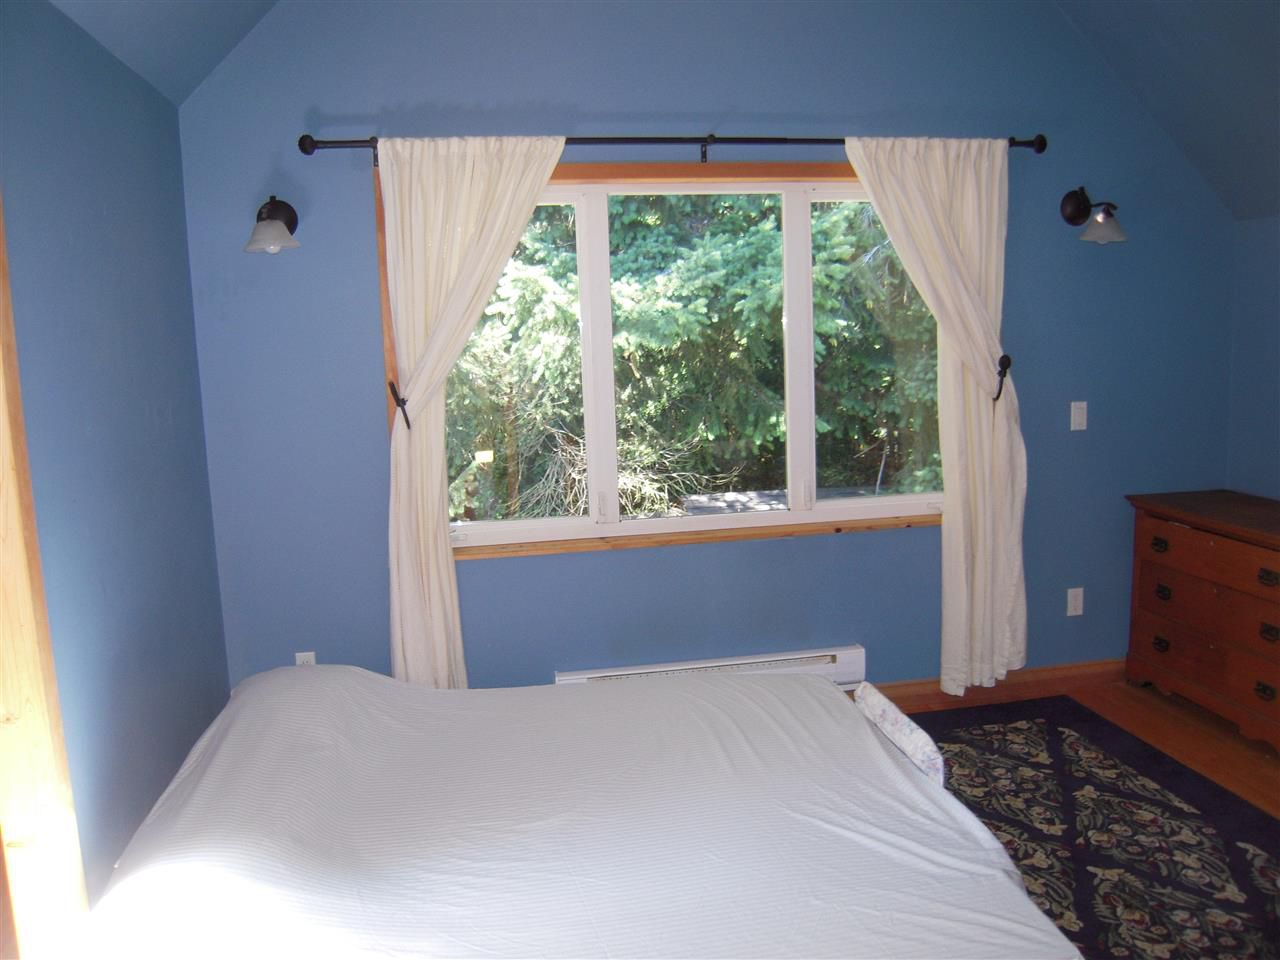 Photo 13: Photos: 2670 LOWER Road: Roberts Creek House for sale (Sunshine Coast)  : MLS®# R2096275